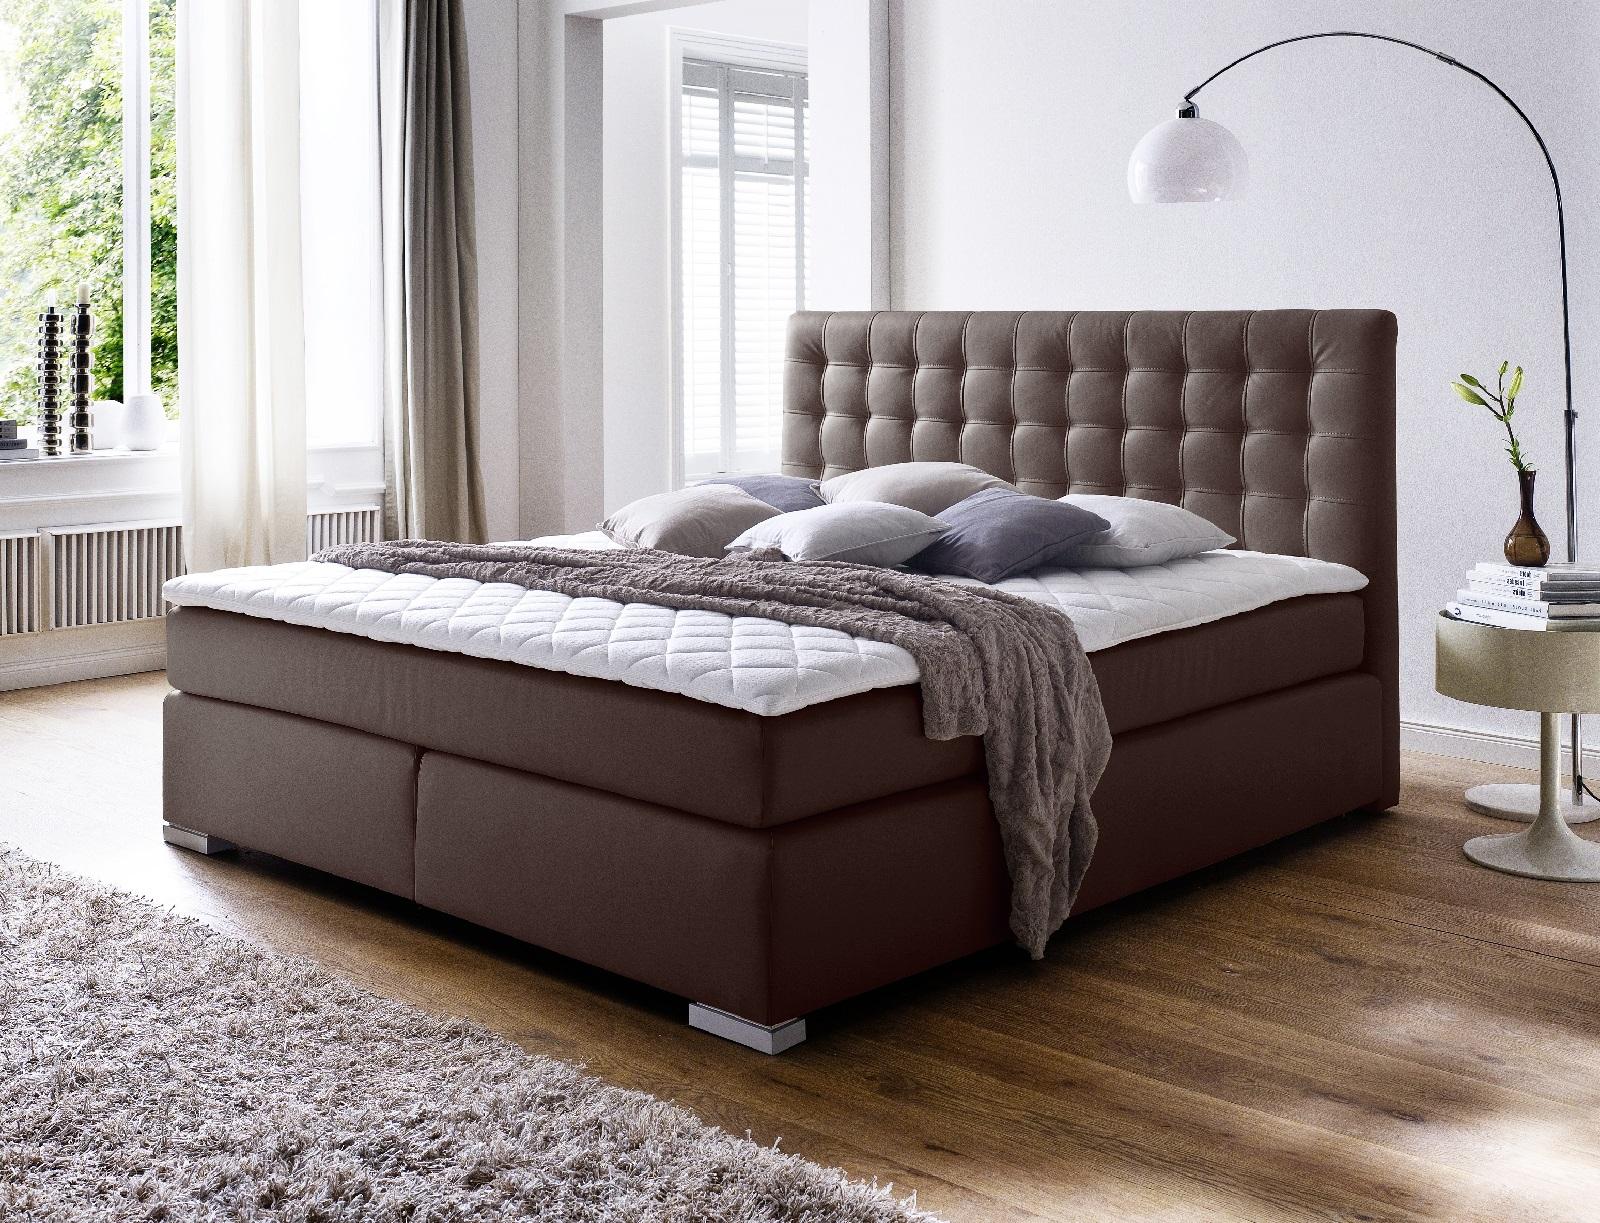 boxspringbett isabelle braun 160cm x 200cm. Black Bedroom Furniture Sets. Home Design Ideas